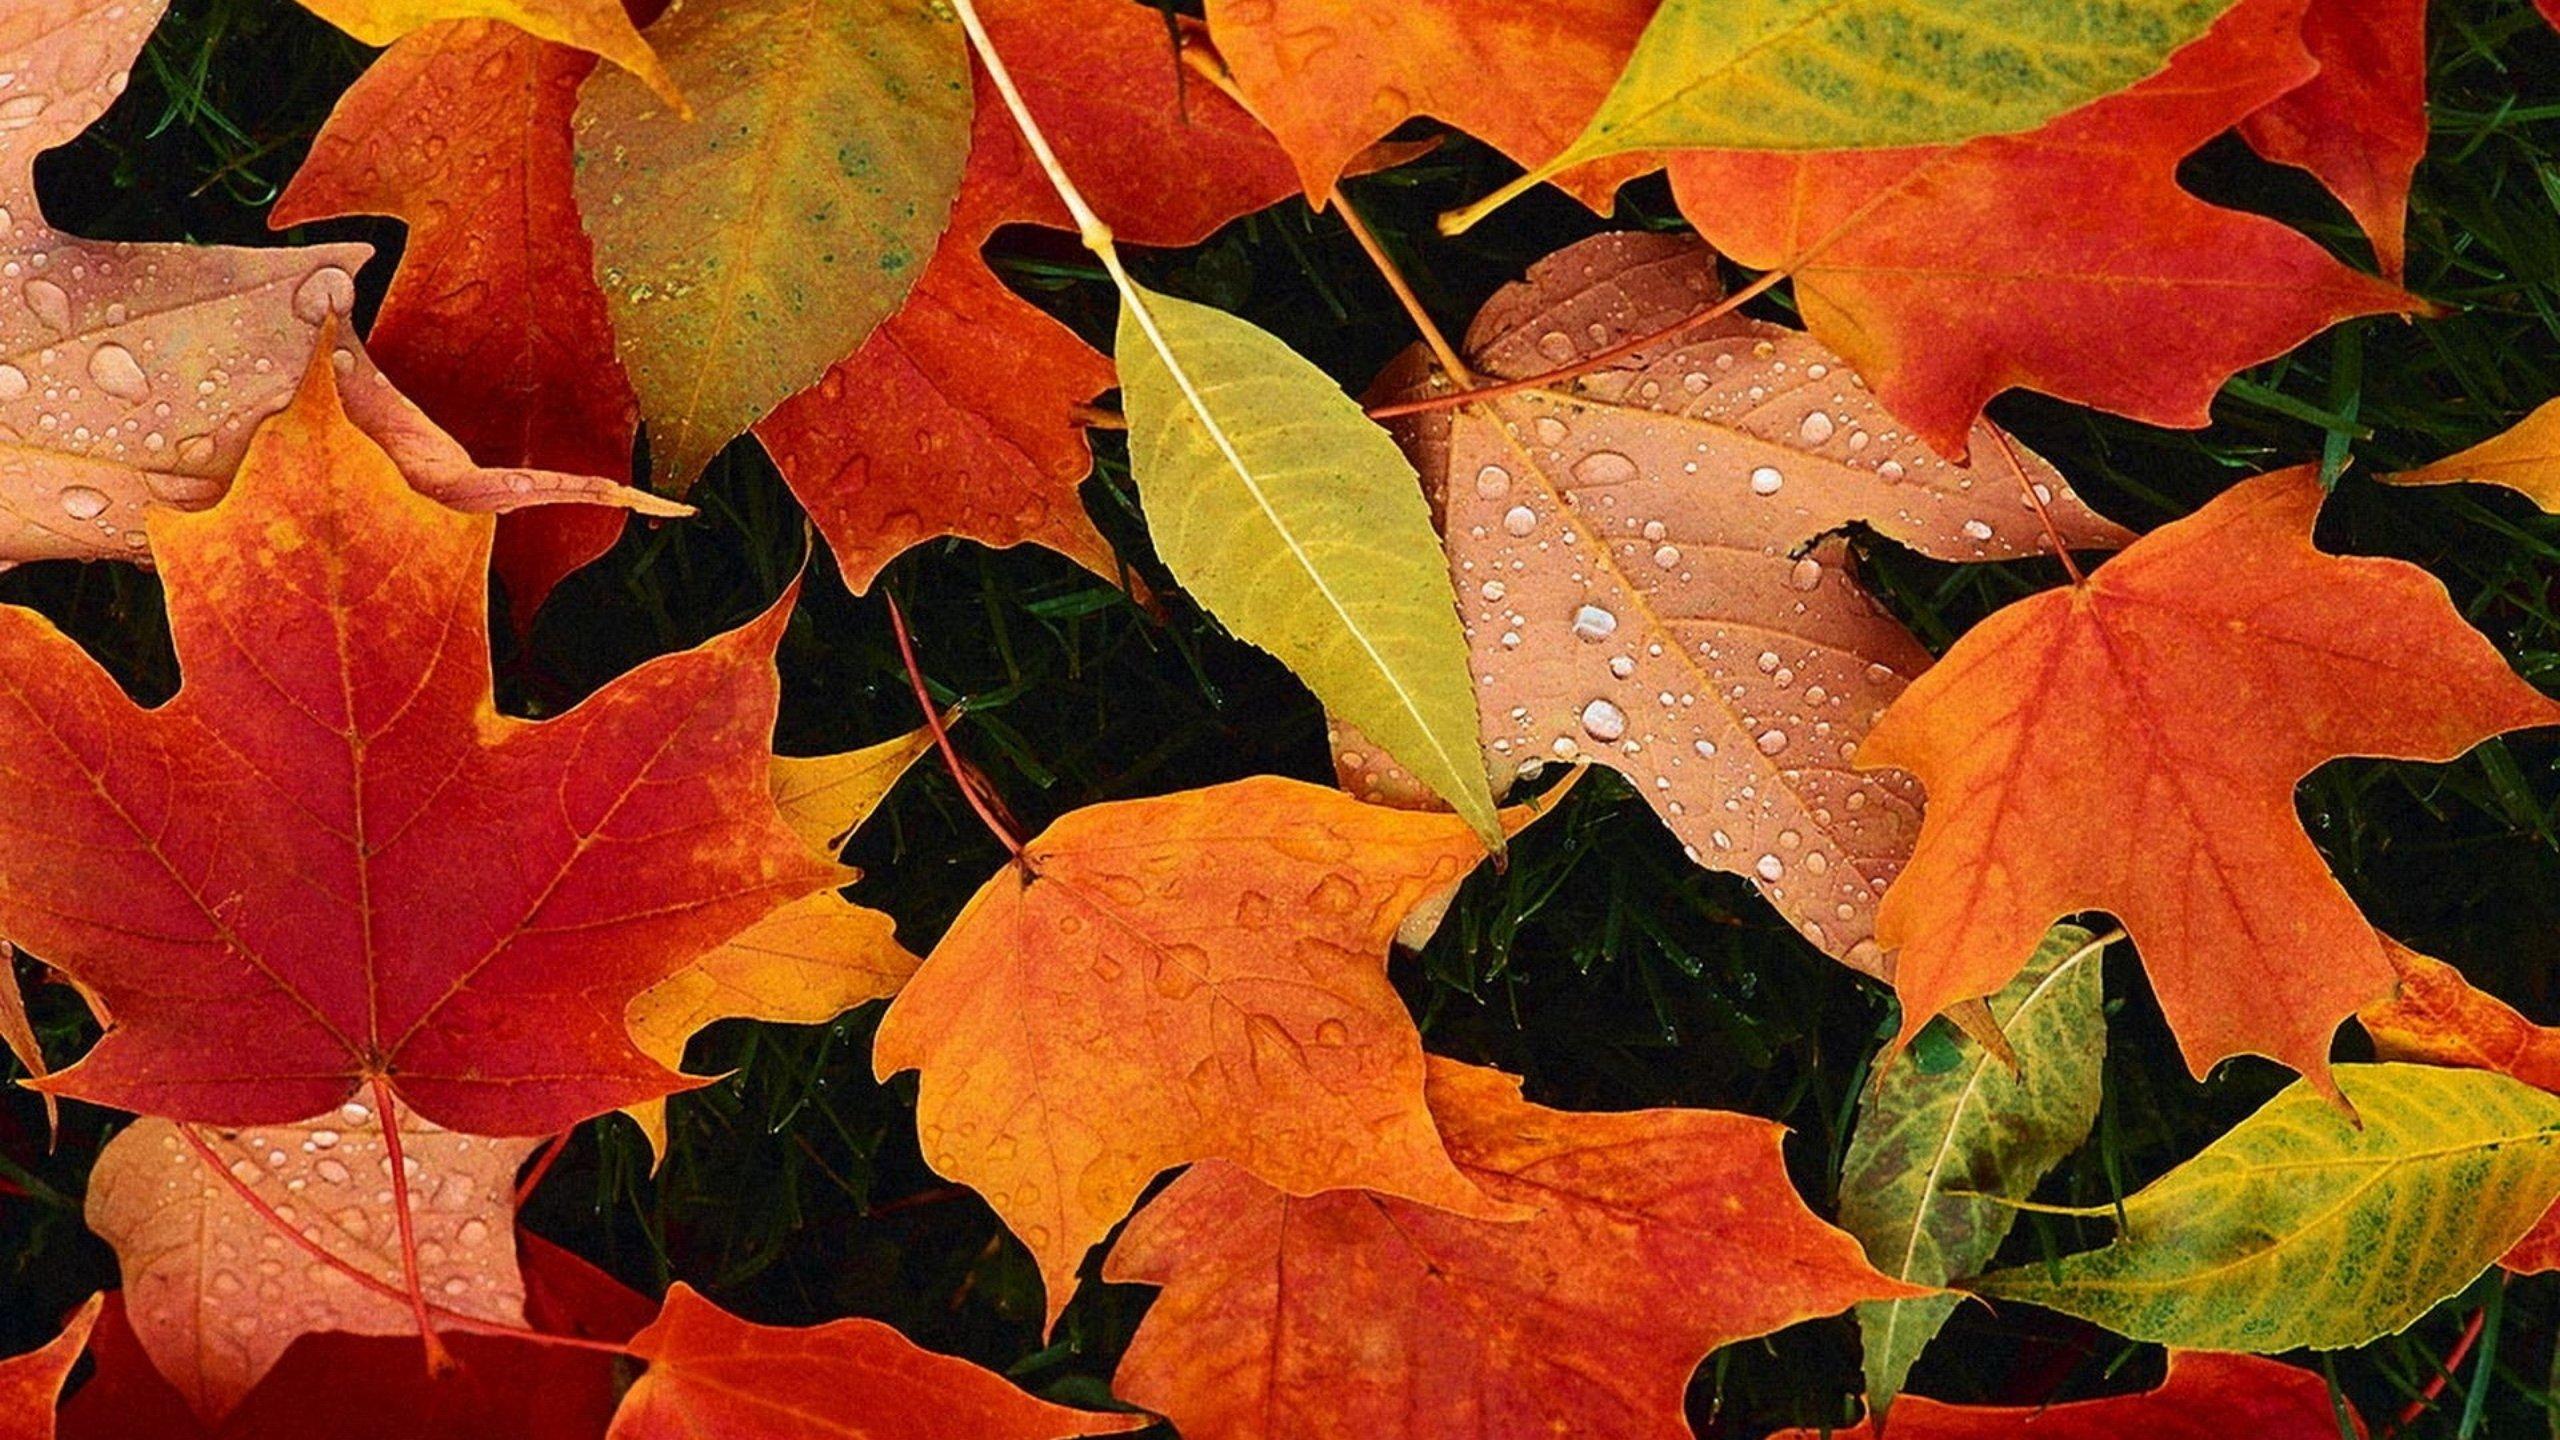 Good Wallpaper Mac Autumn - UTl0p8  Perfect Image Reference_316450.jpeg